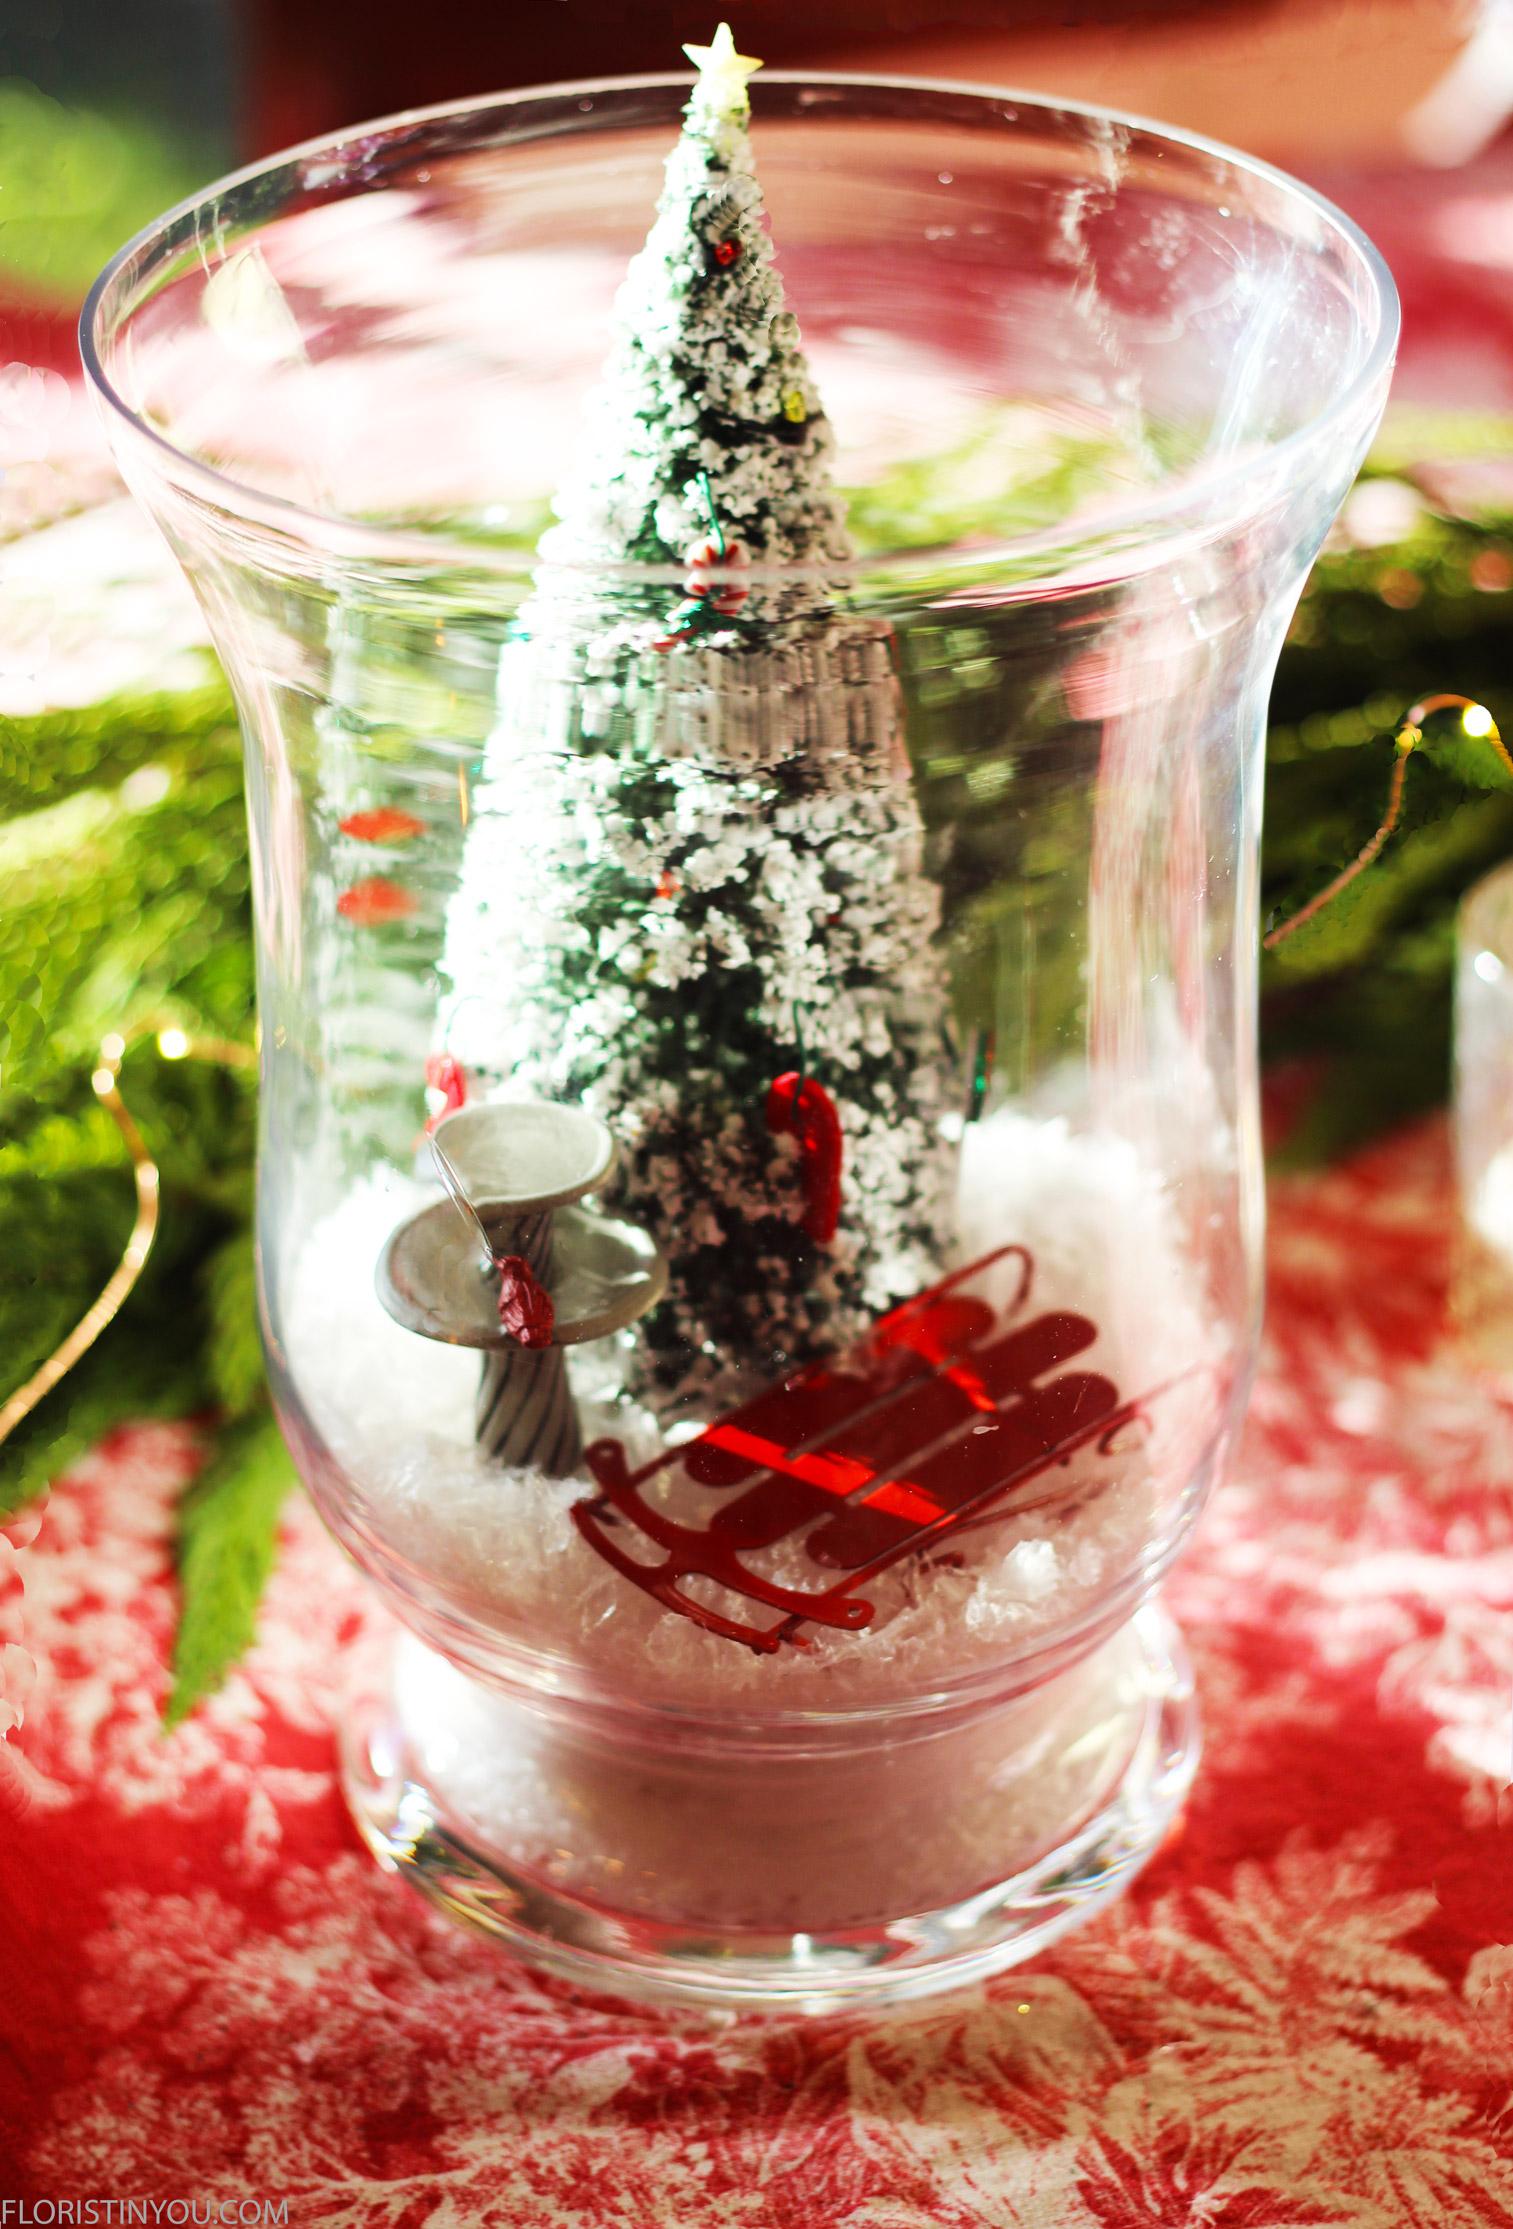 Perfect Christmas Centerpiece